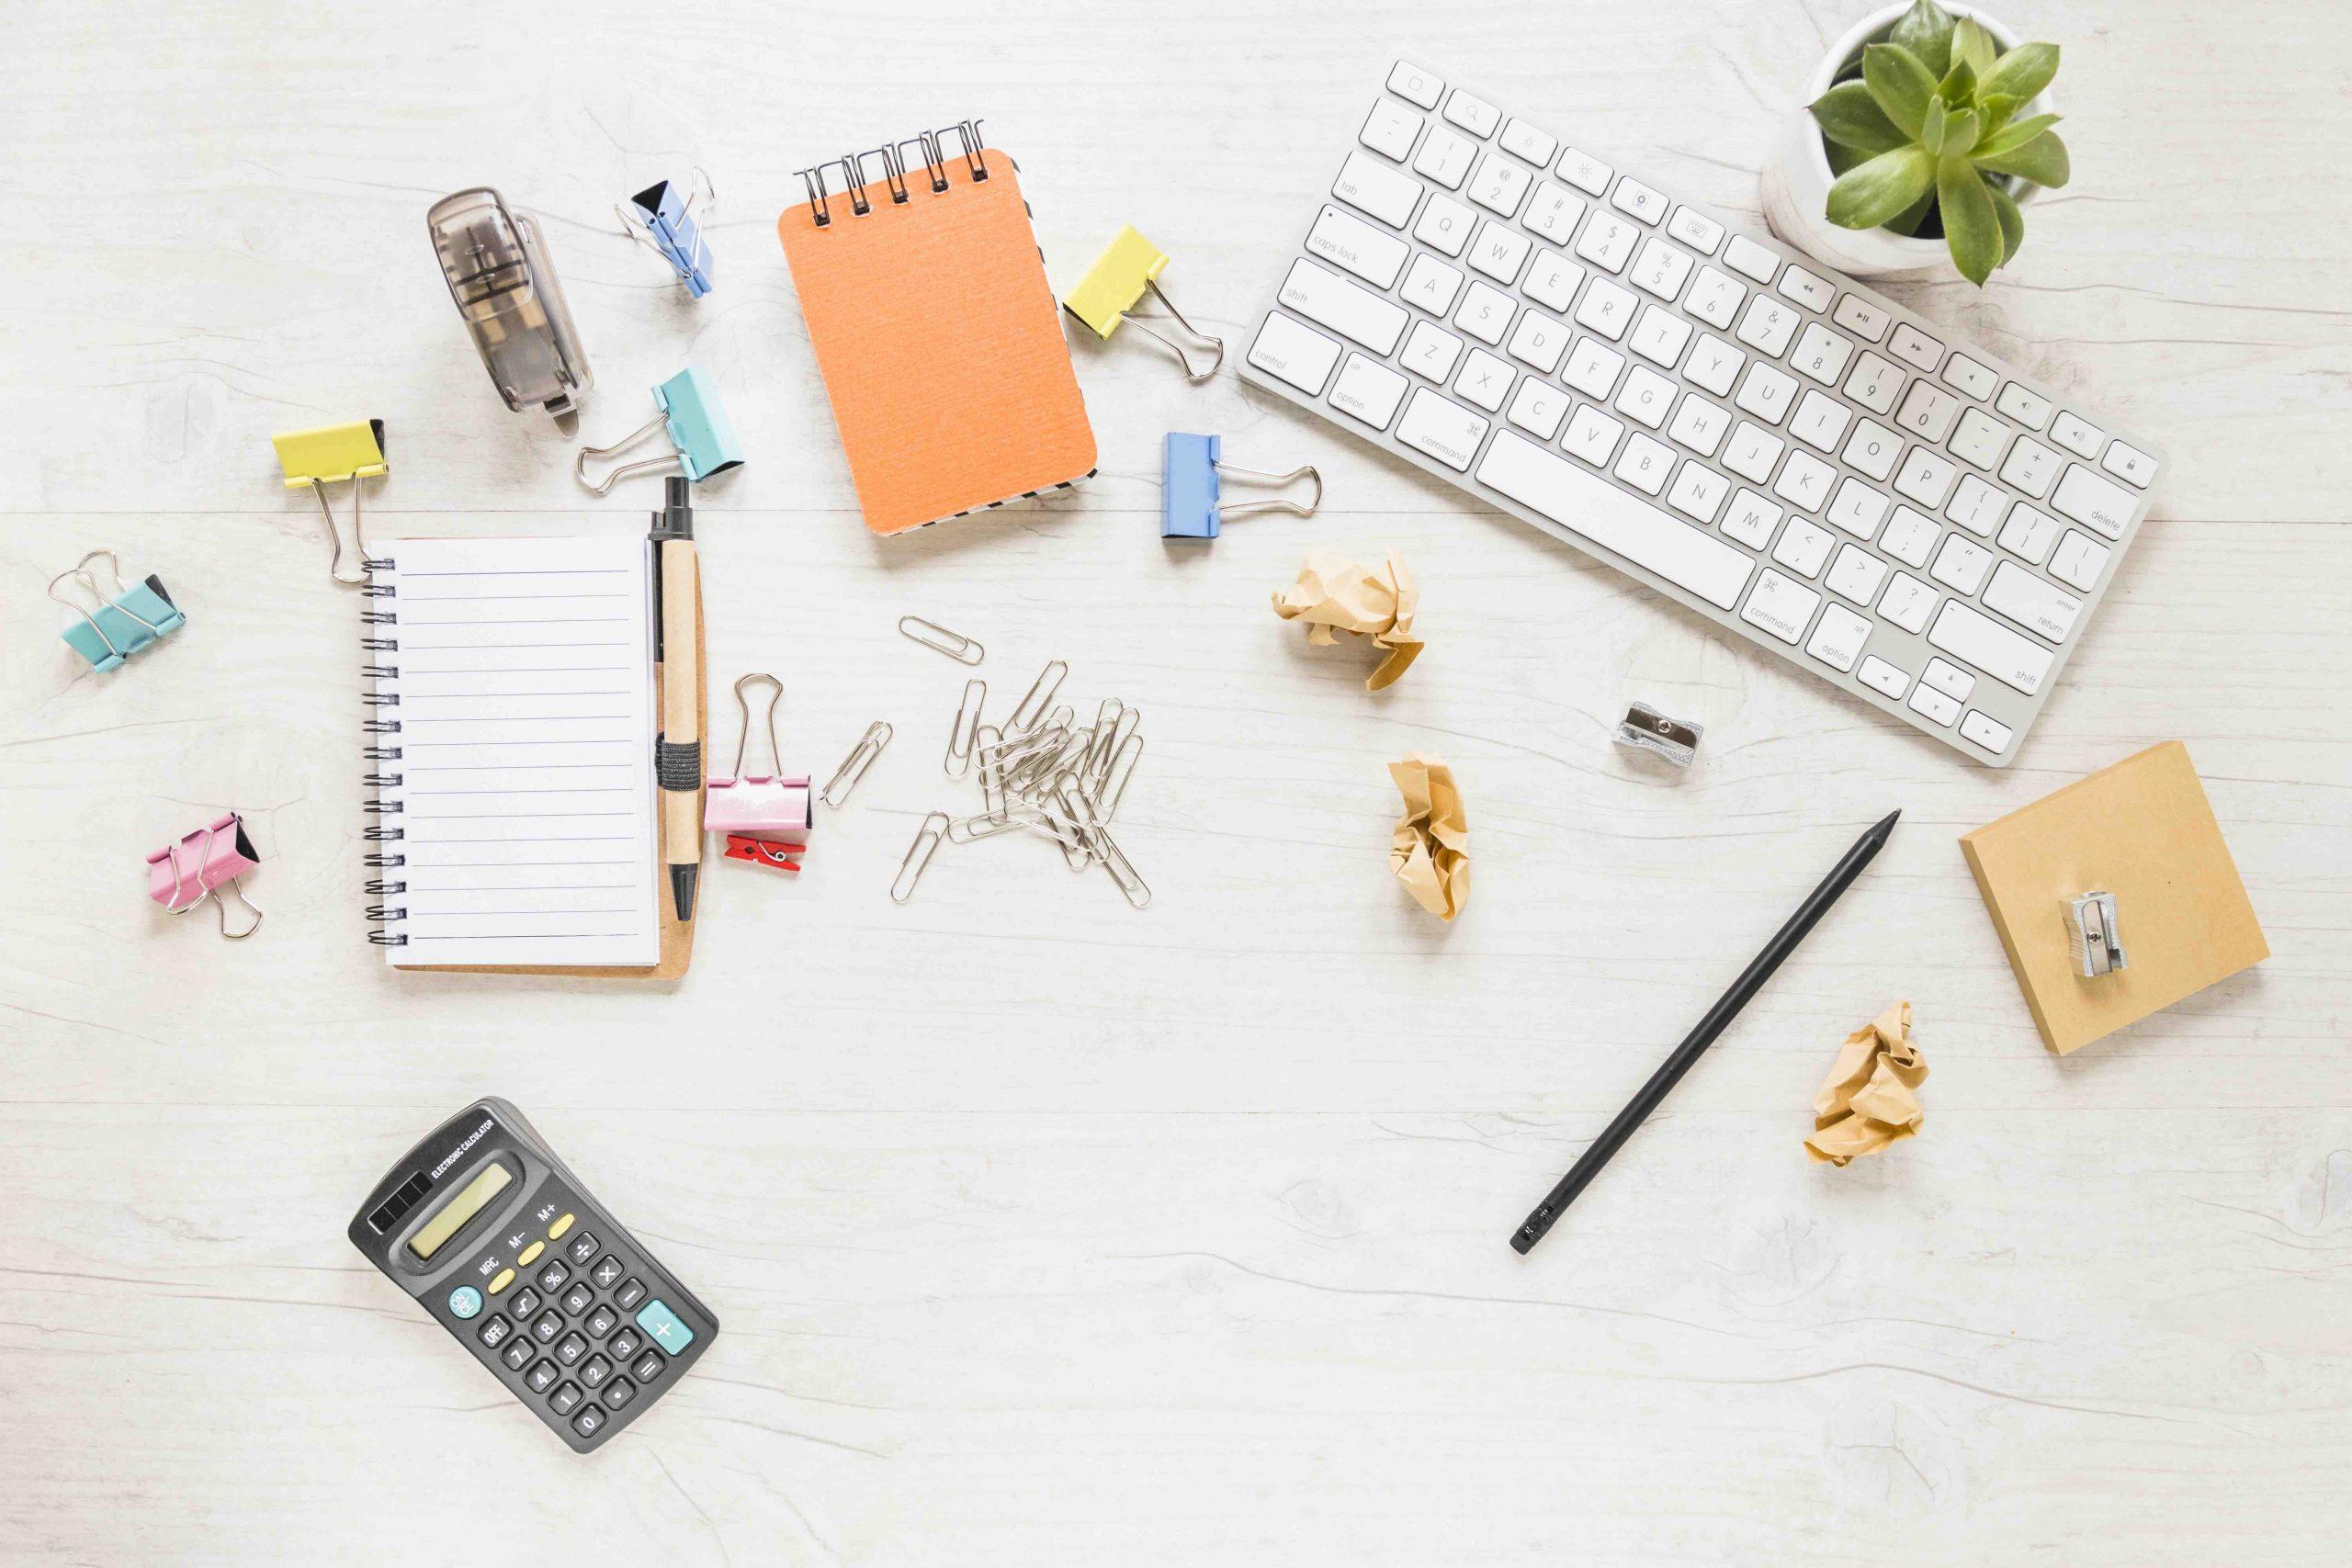 Desktop with keyboard, Paperclips, calculator